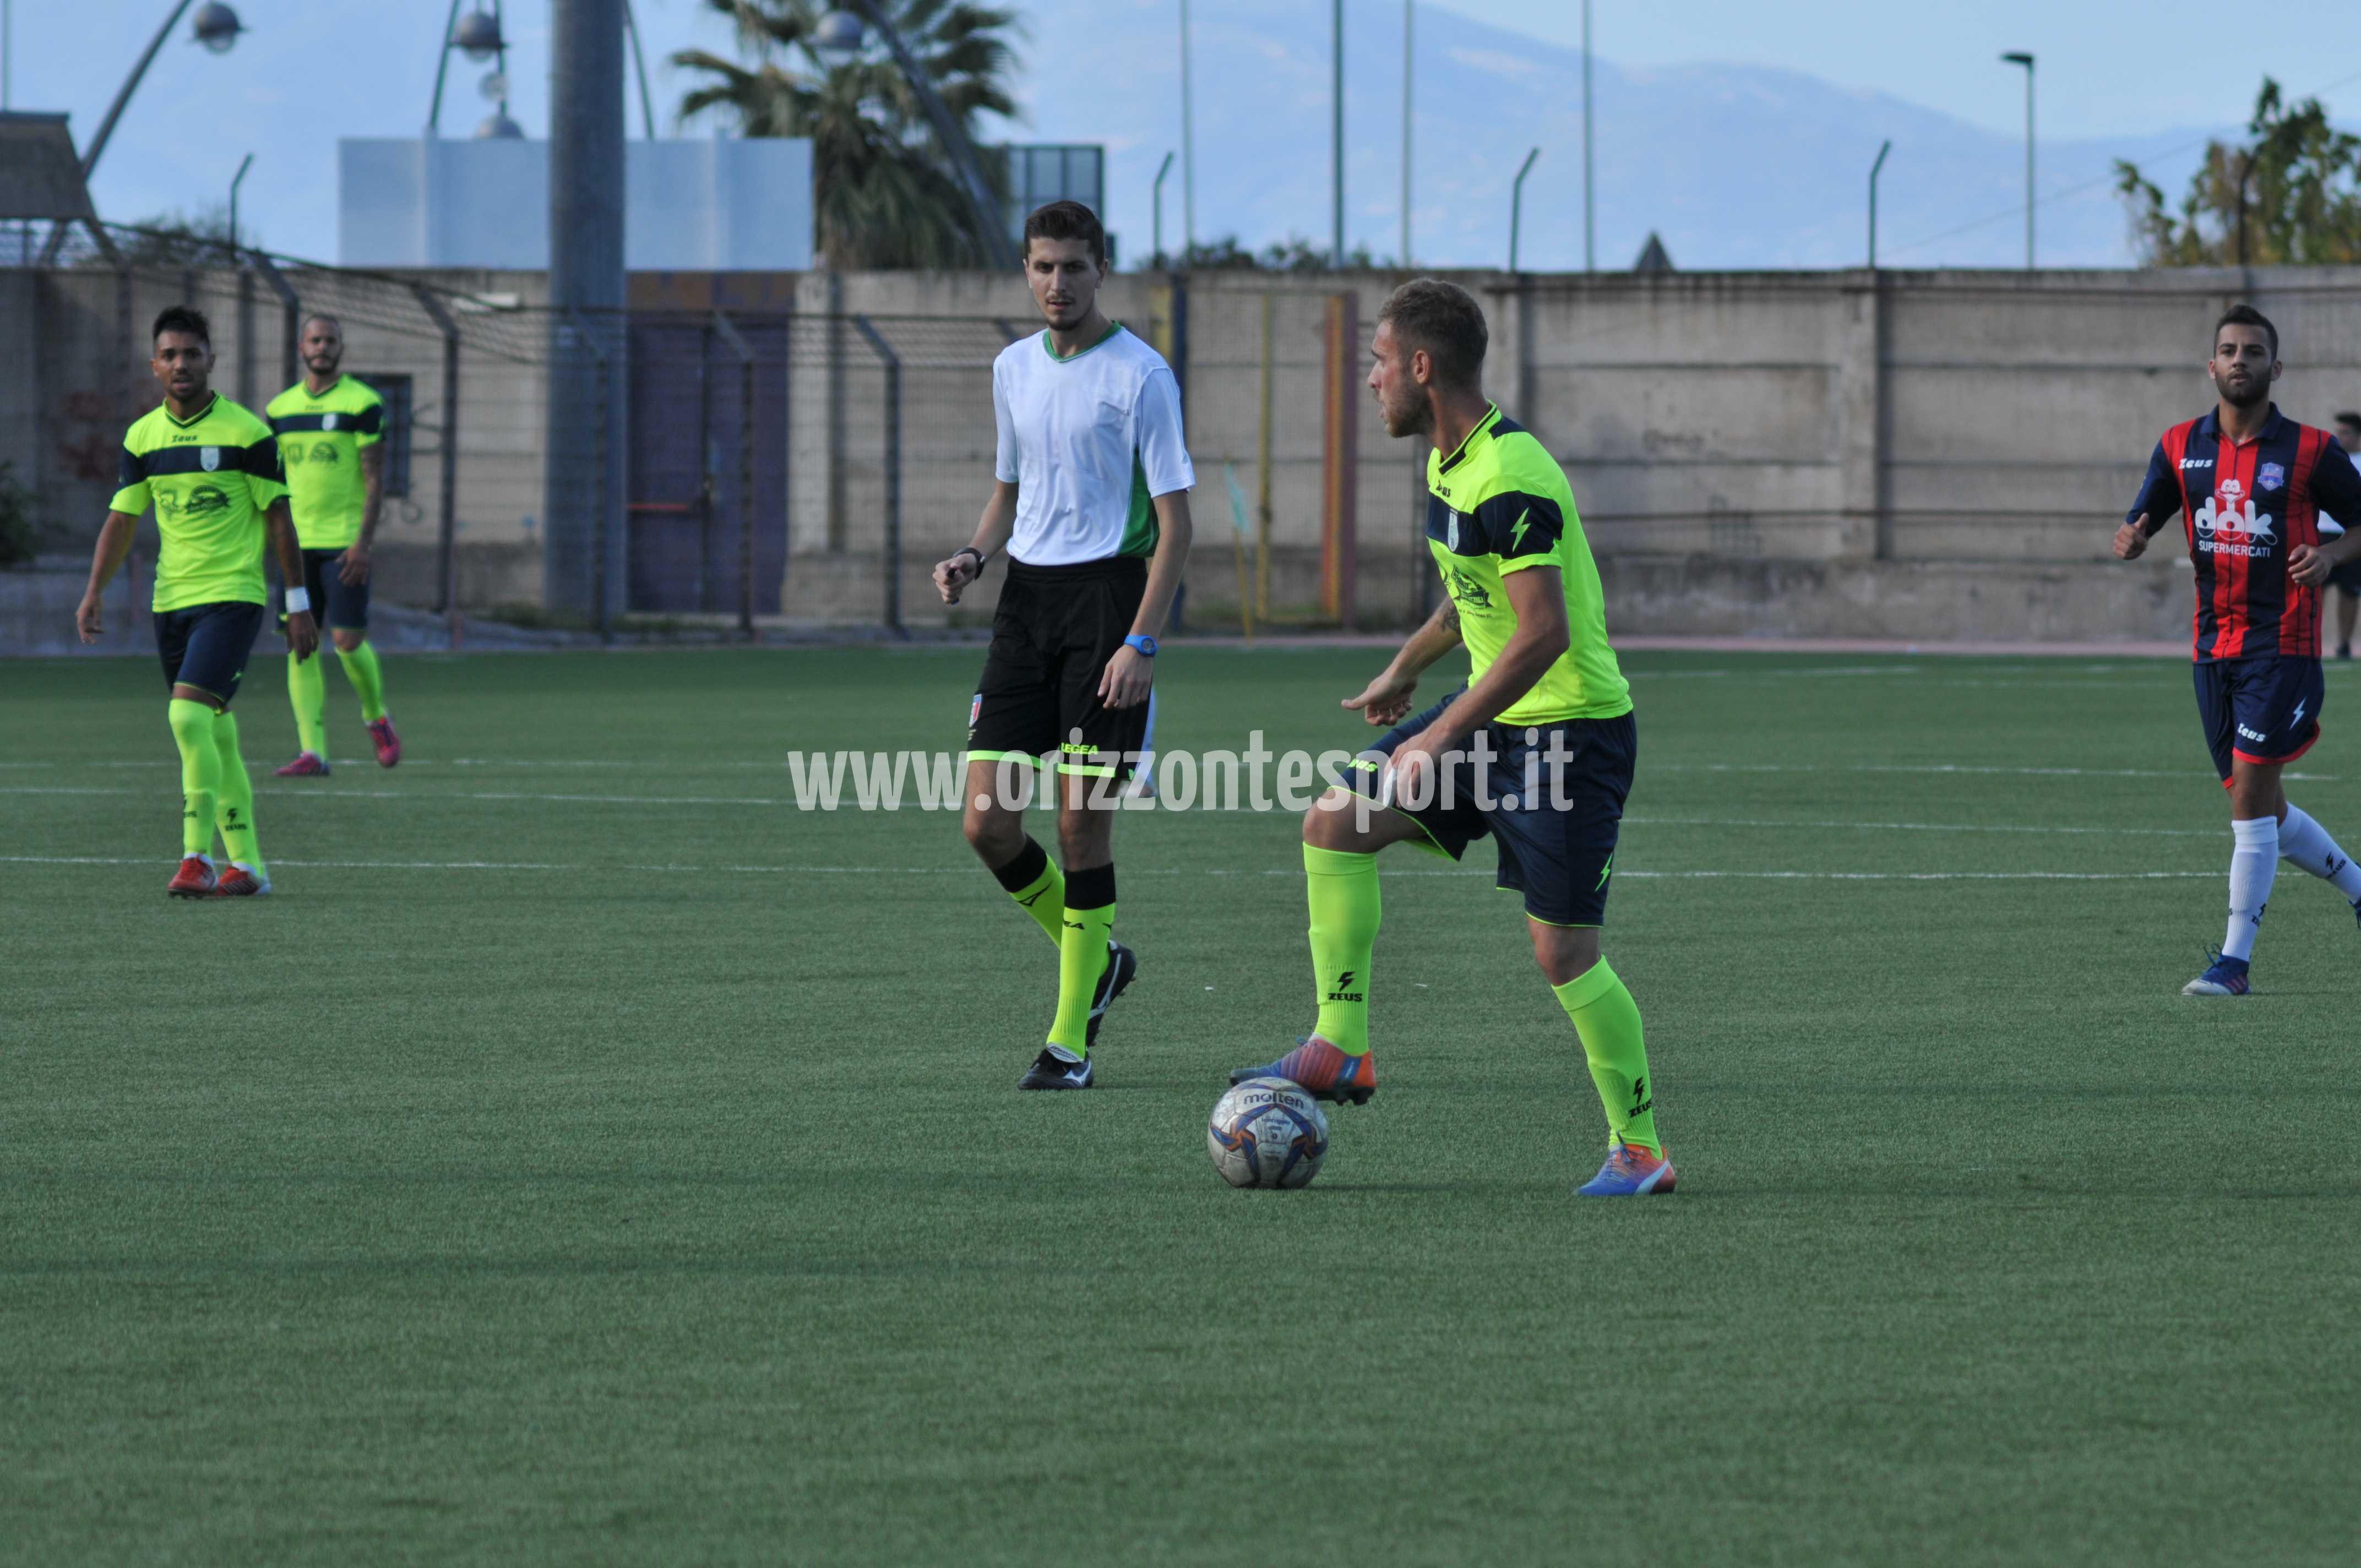 rossanese_praiatrtora_cpppa_italia (40)